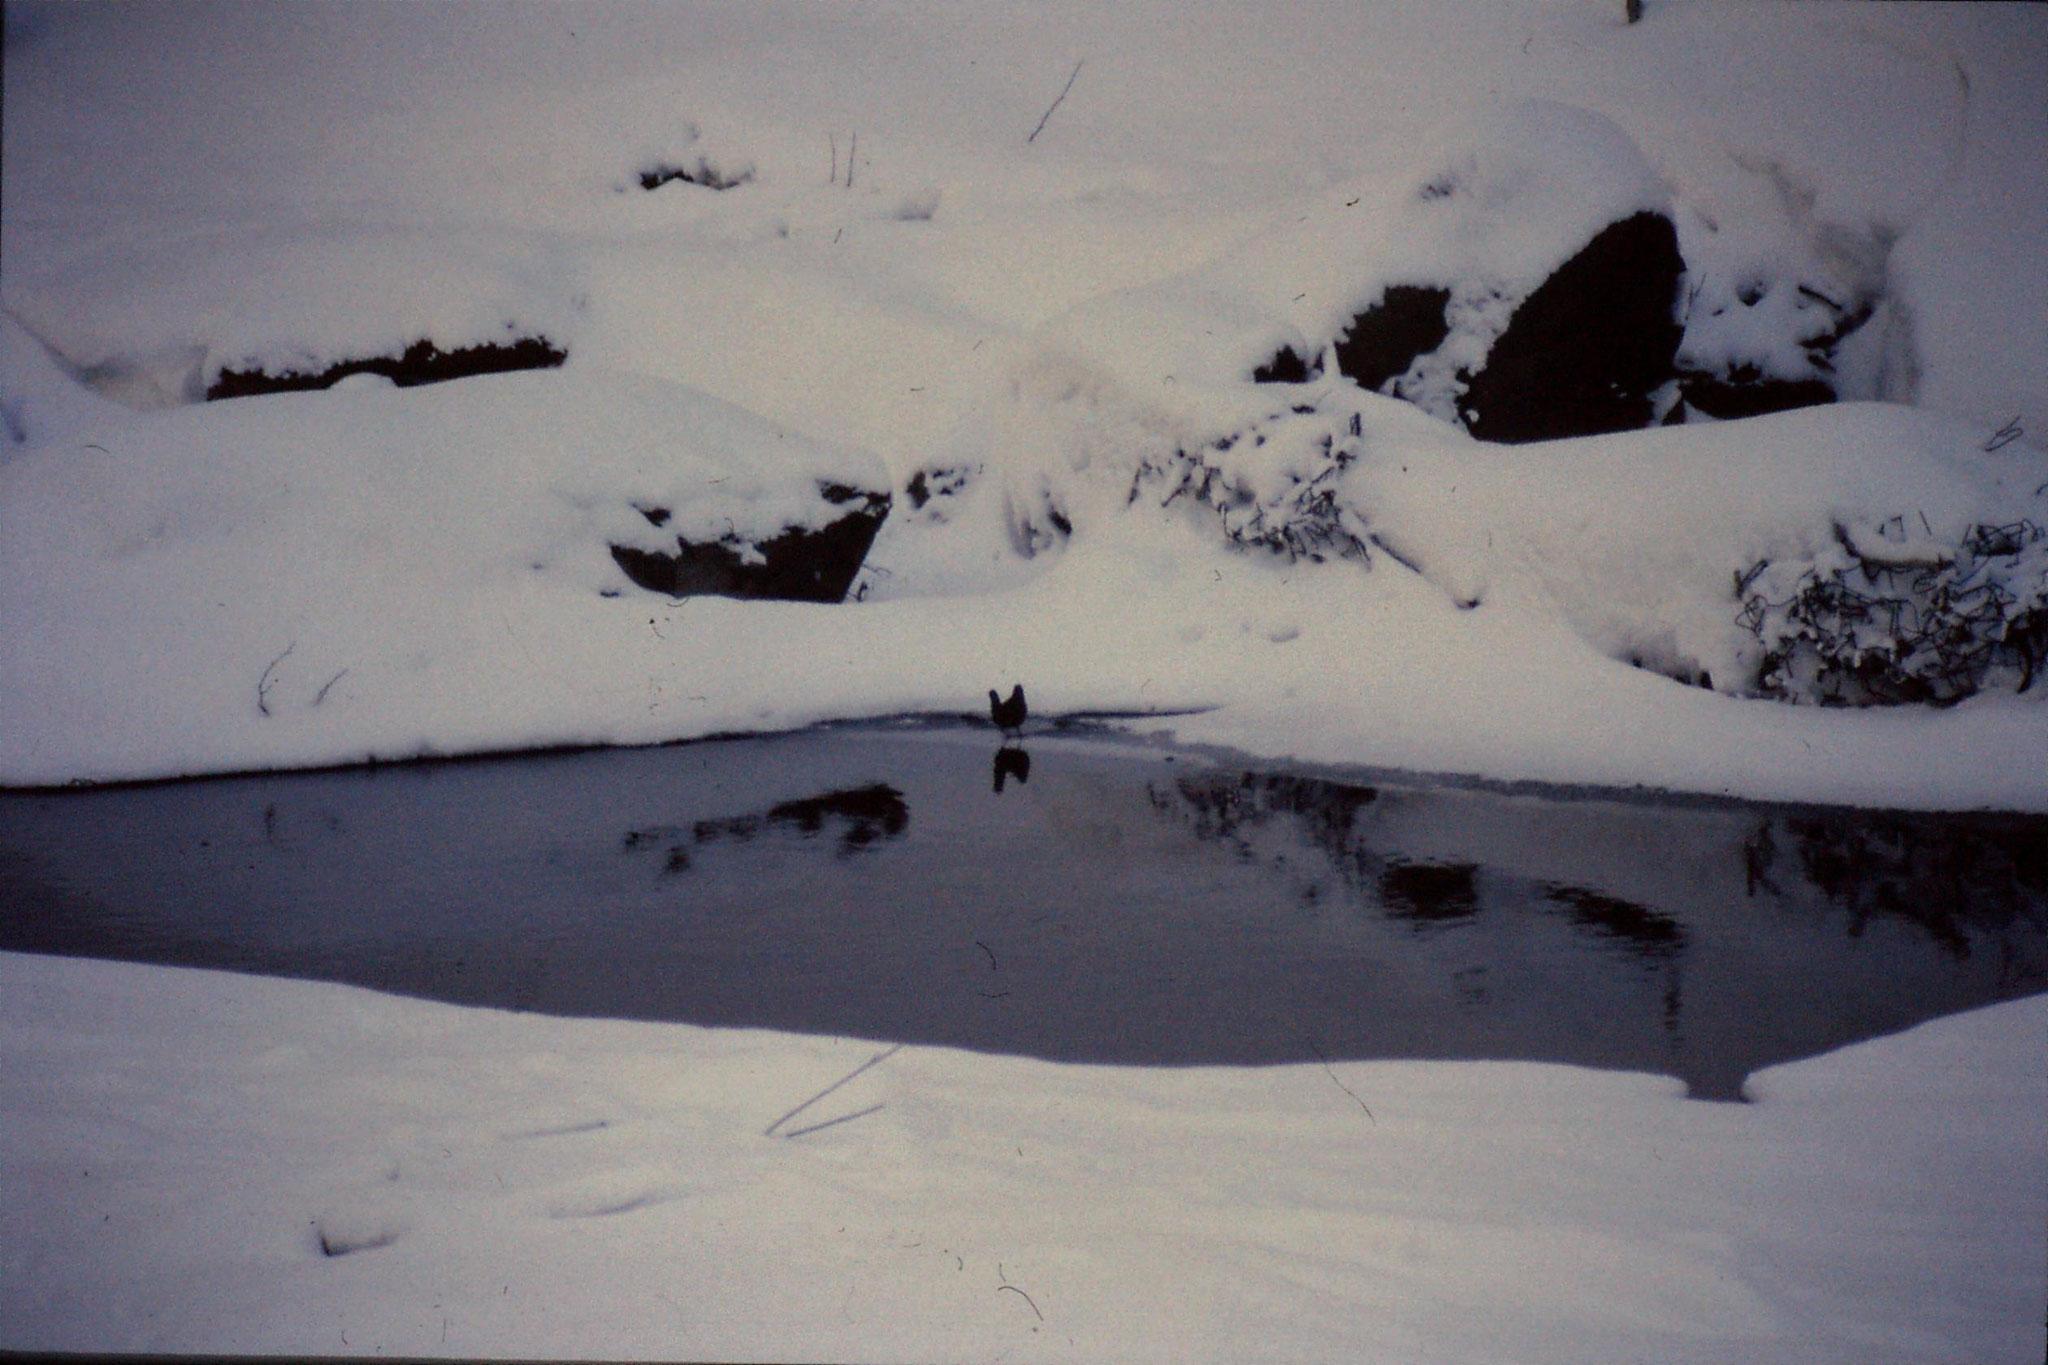 12/1/1989: 19: Sounkyo Onsen Gorge